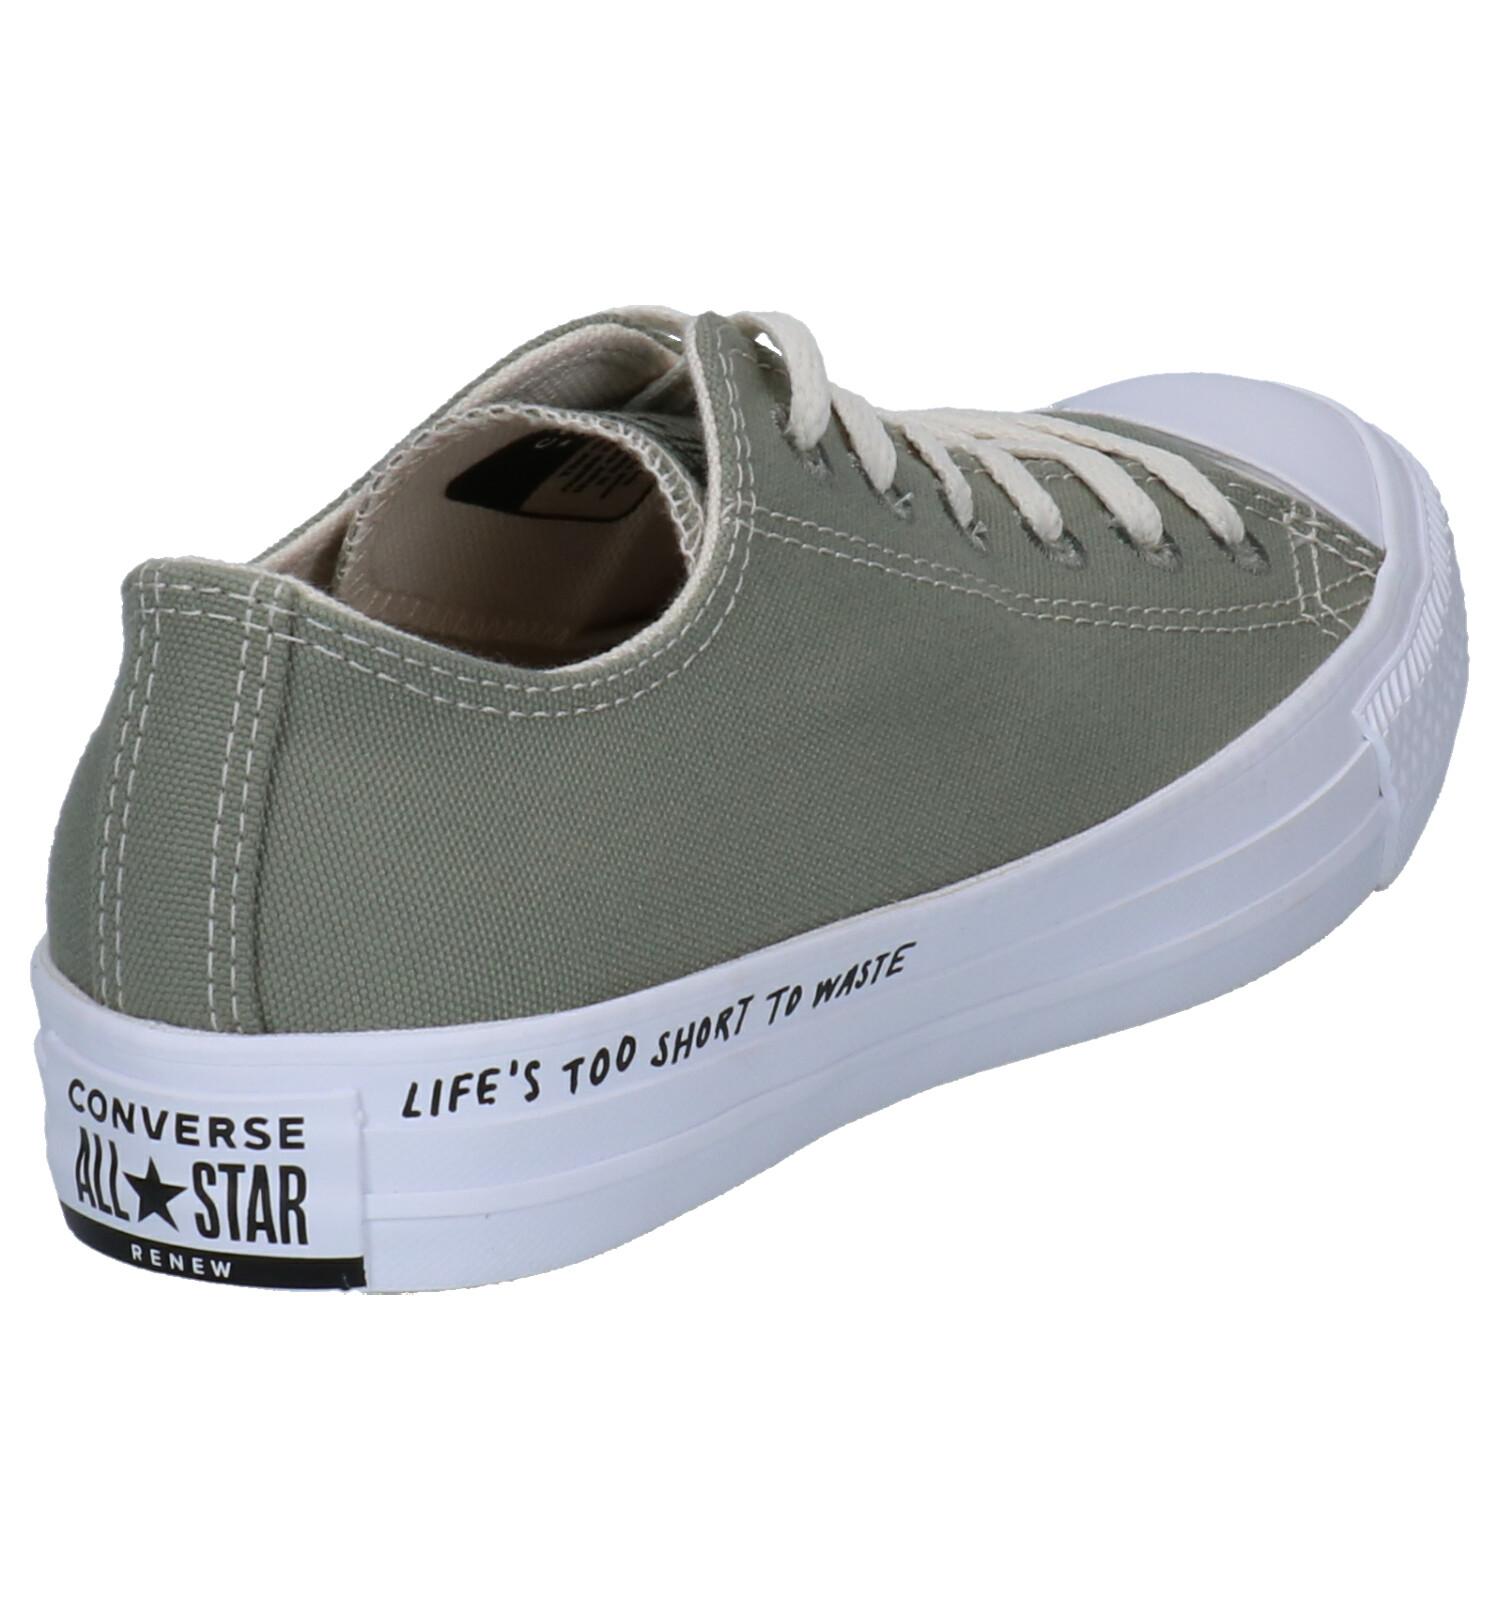 Renew Groene Sneakers Converse All Star Ivf6gb7Yym